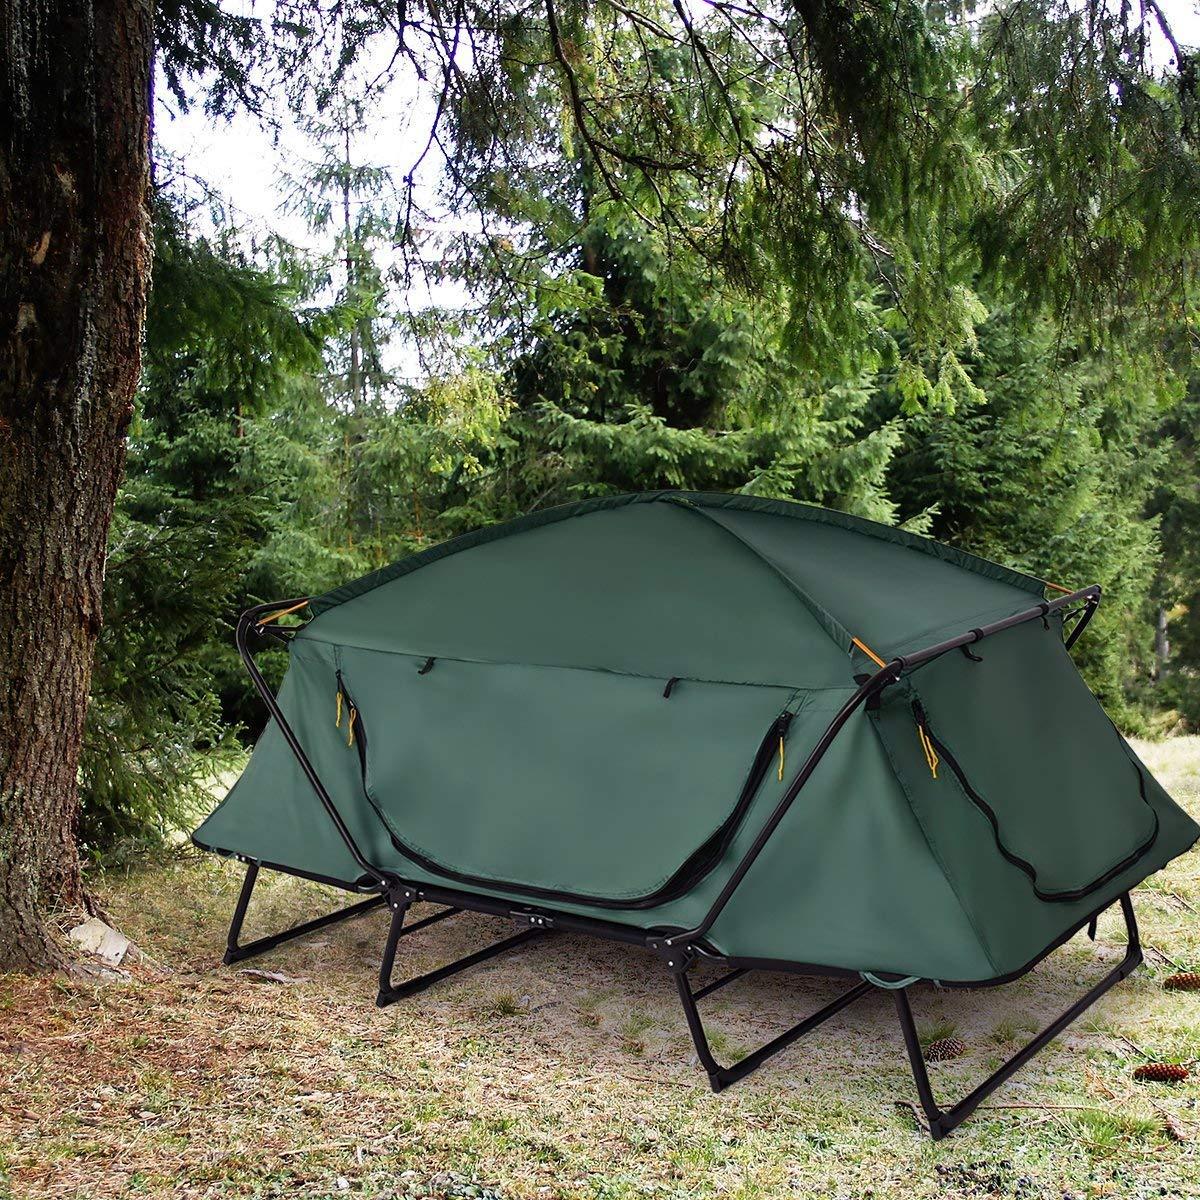 Tangkula Tent Cot Folding Waterproof 2 Person Hiking ...